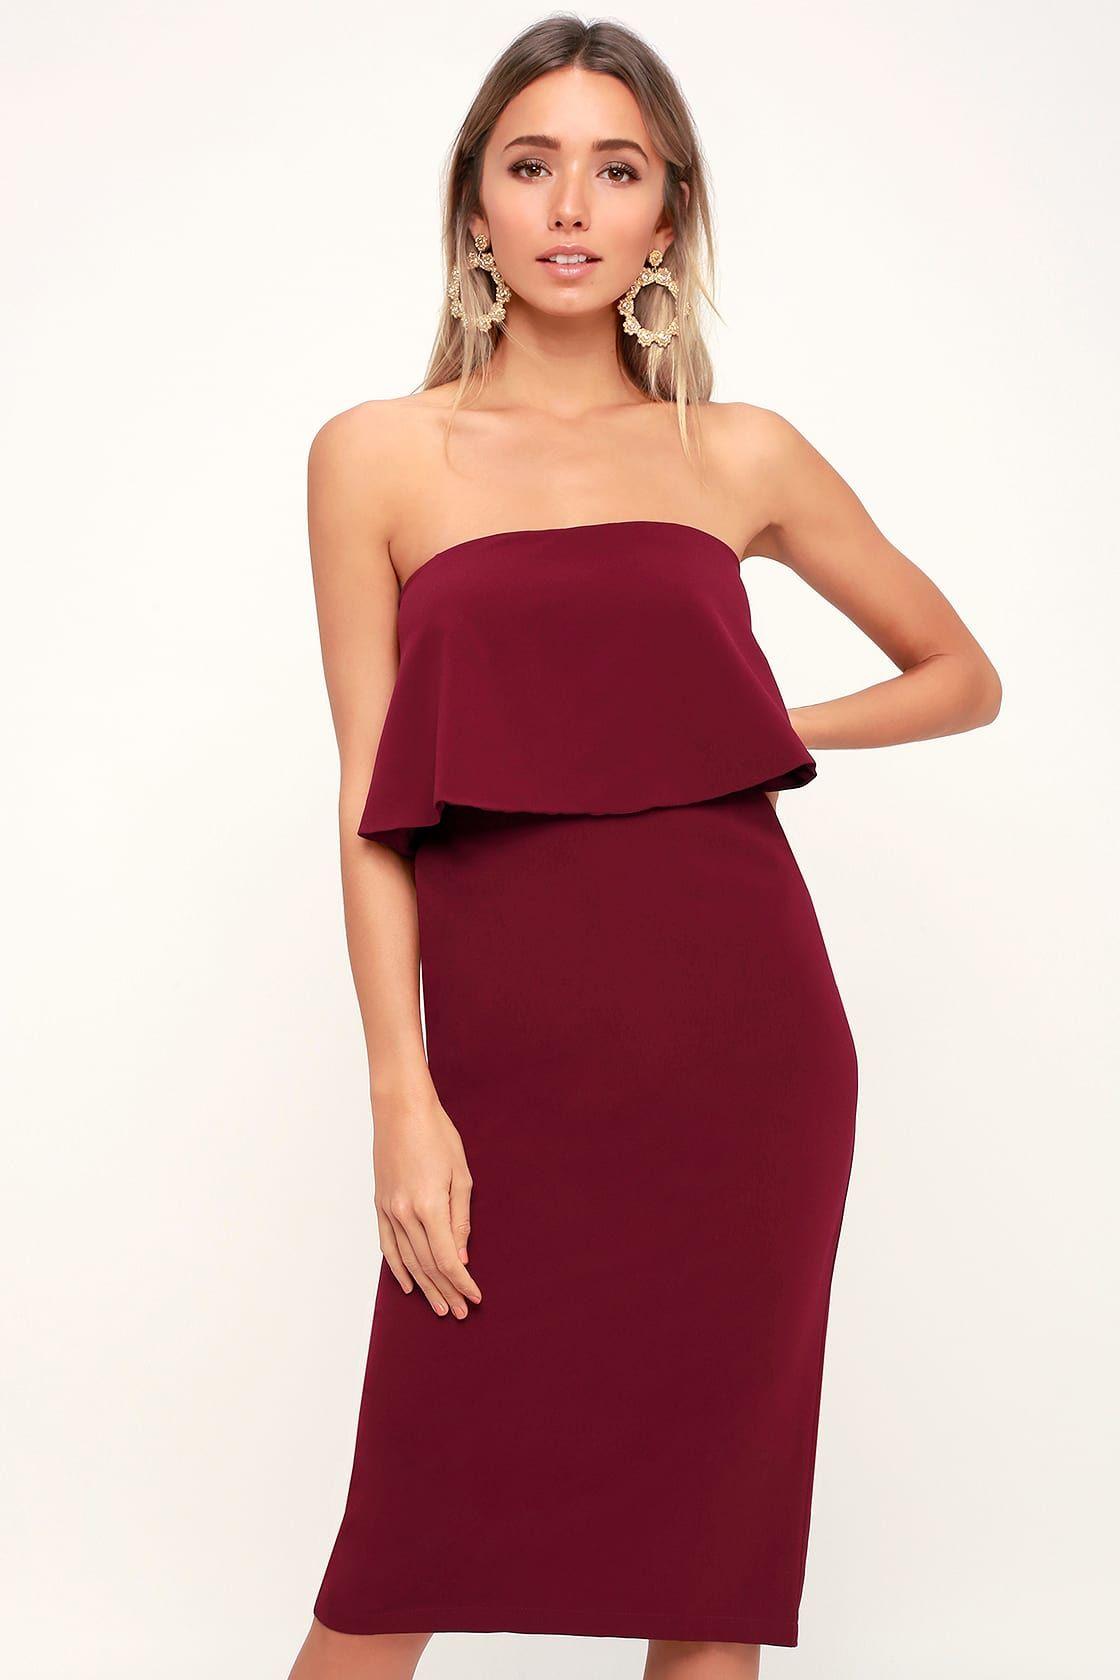 Lots Of Love Burgundy Strapless Midi Dress Strapless Midi Dress Dresses Women Dress Online [ 1680 x 1120 Pixel ]